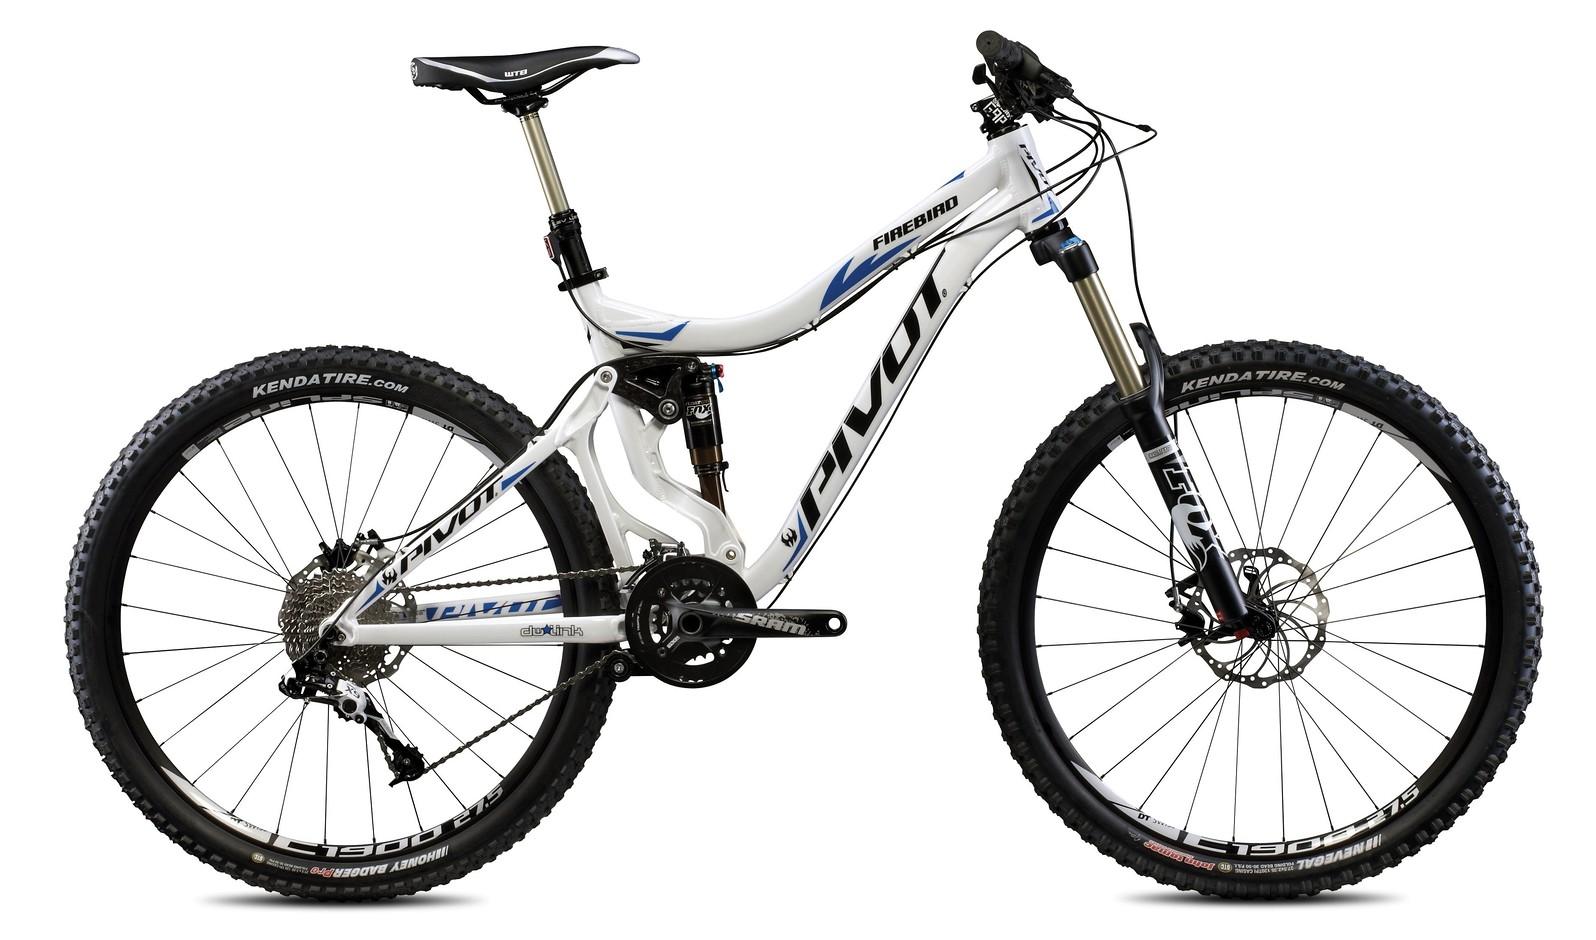 2014 Pivot Firebird 27.5 bike